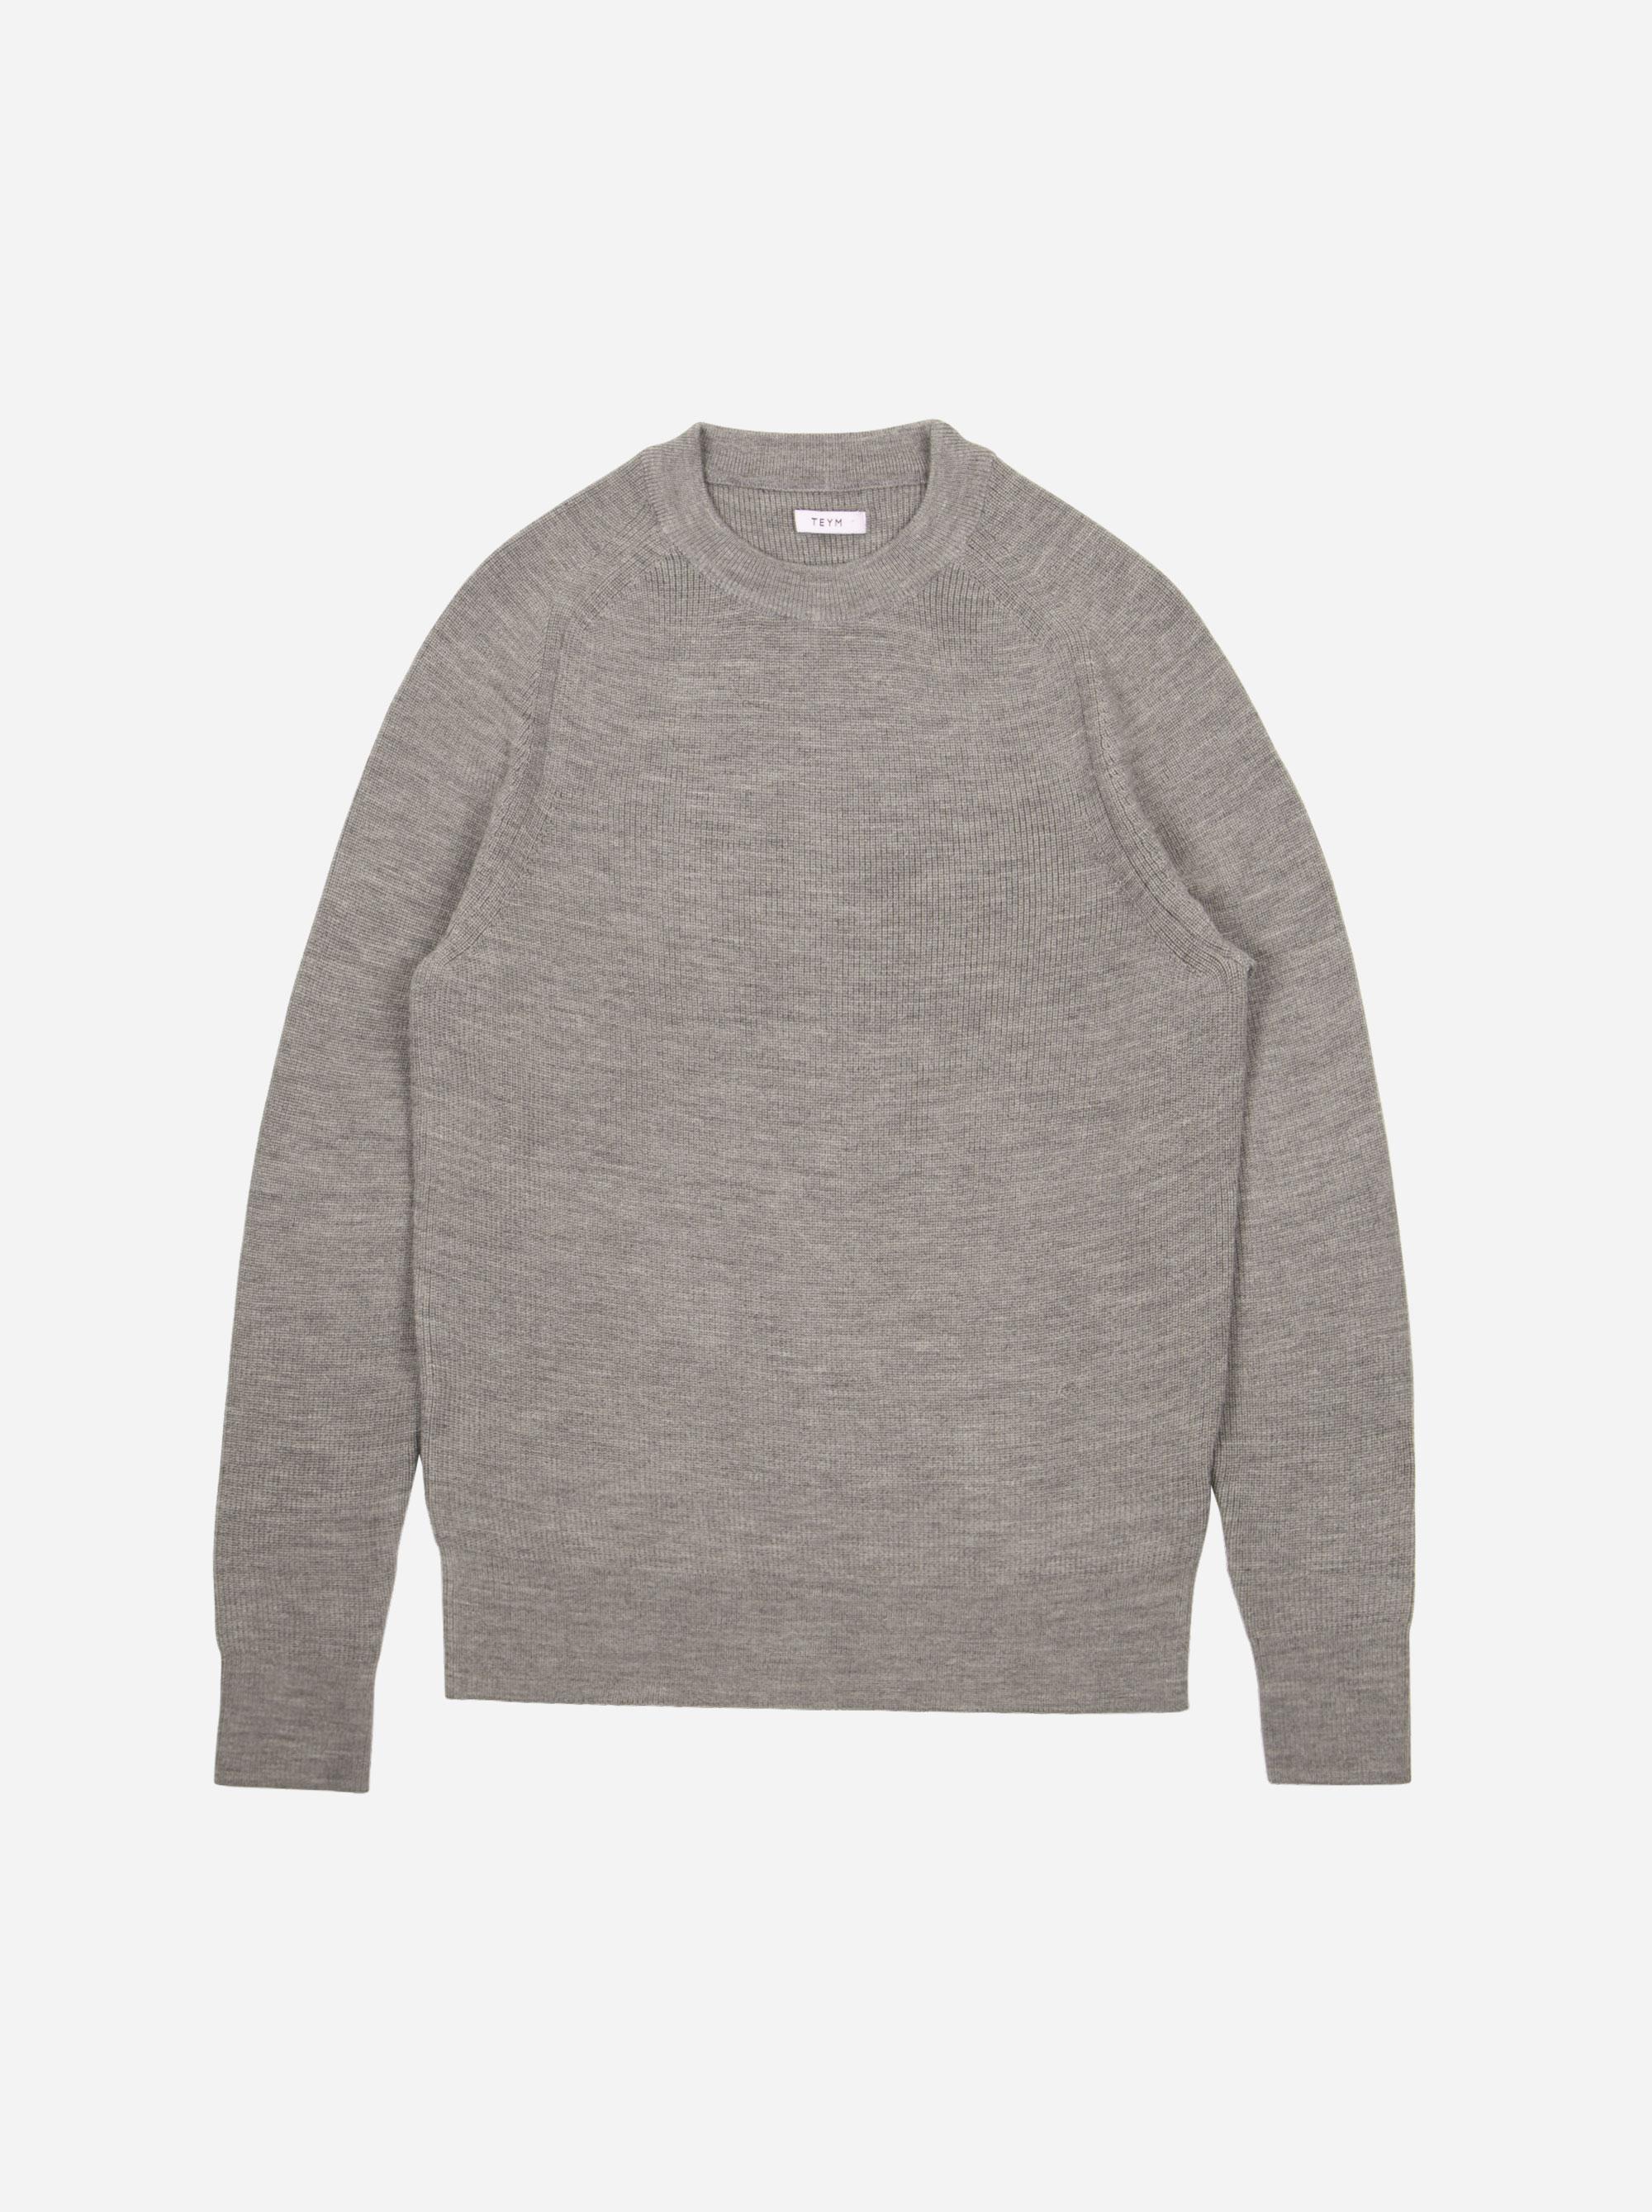 Teym - Crewneck - The Merino Sweater - Men - Grey - 5